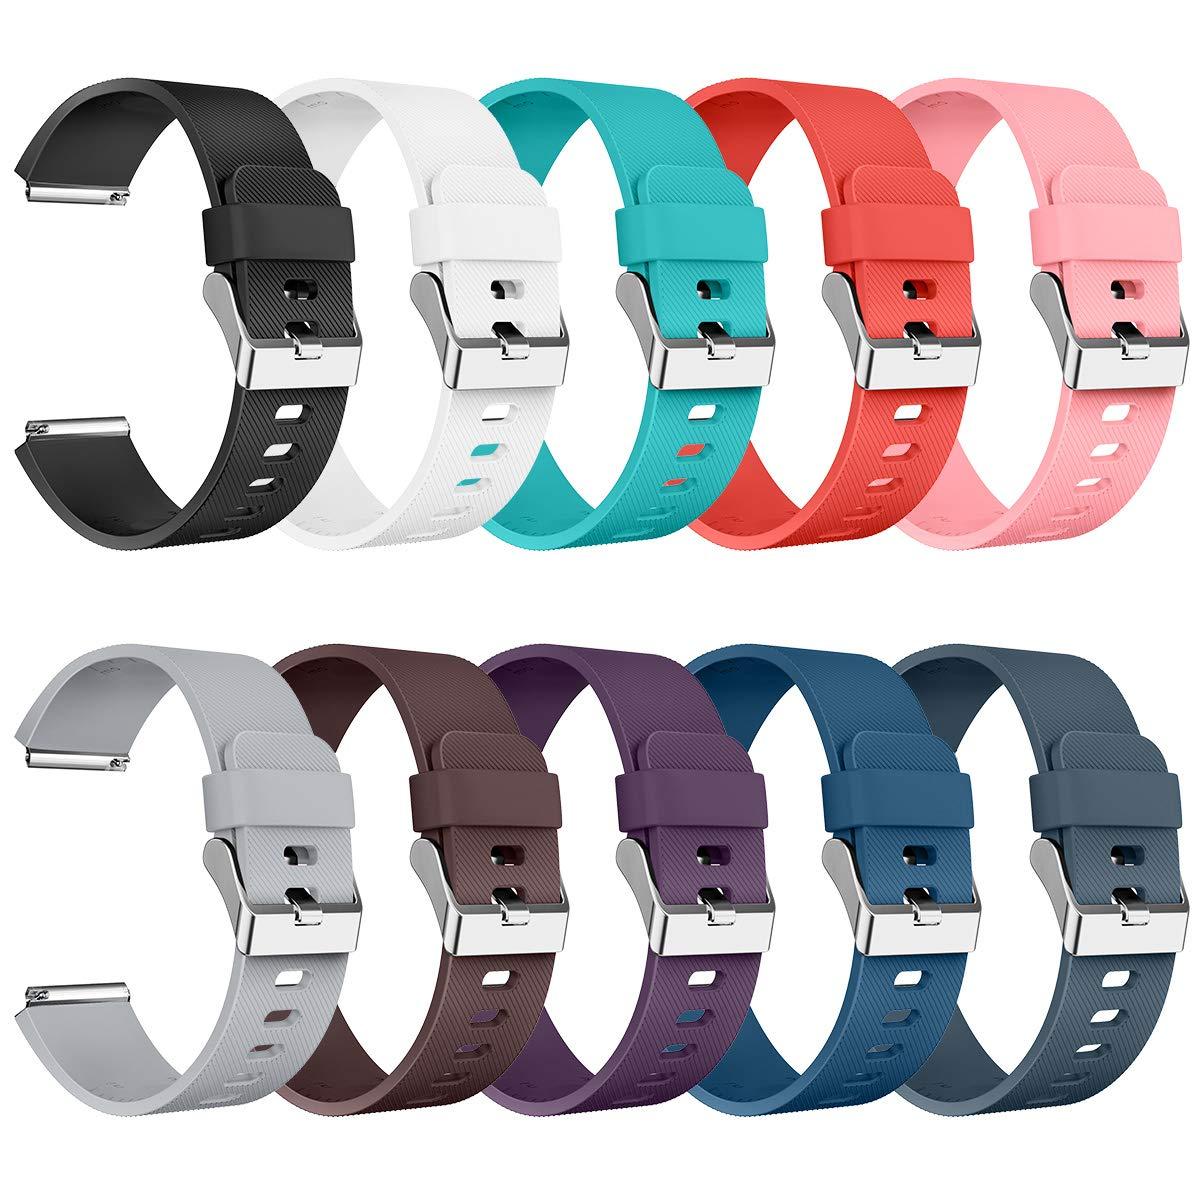 AIUNIT Compatible Fitbit Blaze Bands Large, Replacement for Fitbit Blaze Accessories Wristband Watch Sport Strap for Fitbit Blaze Smart Tracker Women Men Teends Stripe Texture 10 Pack No Tracker